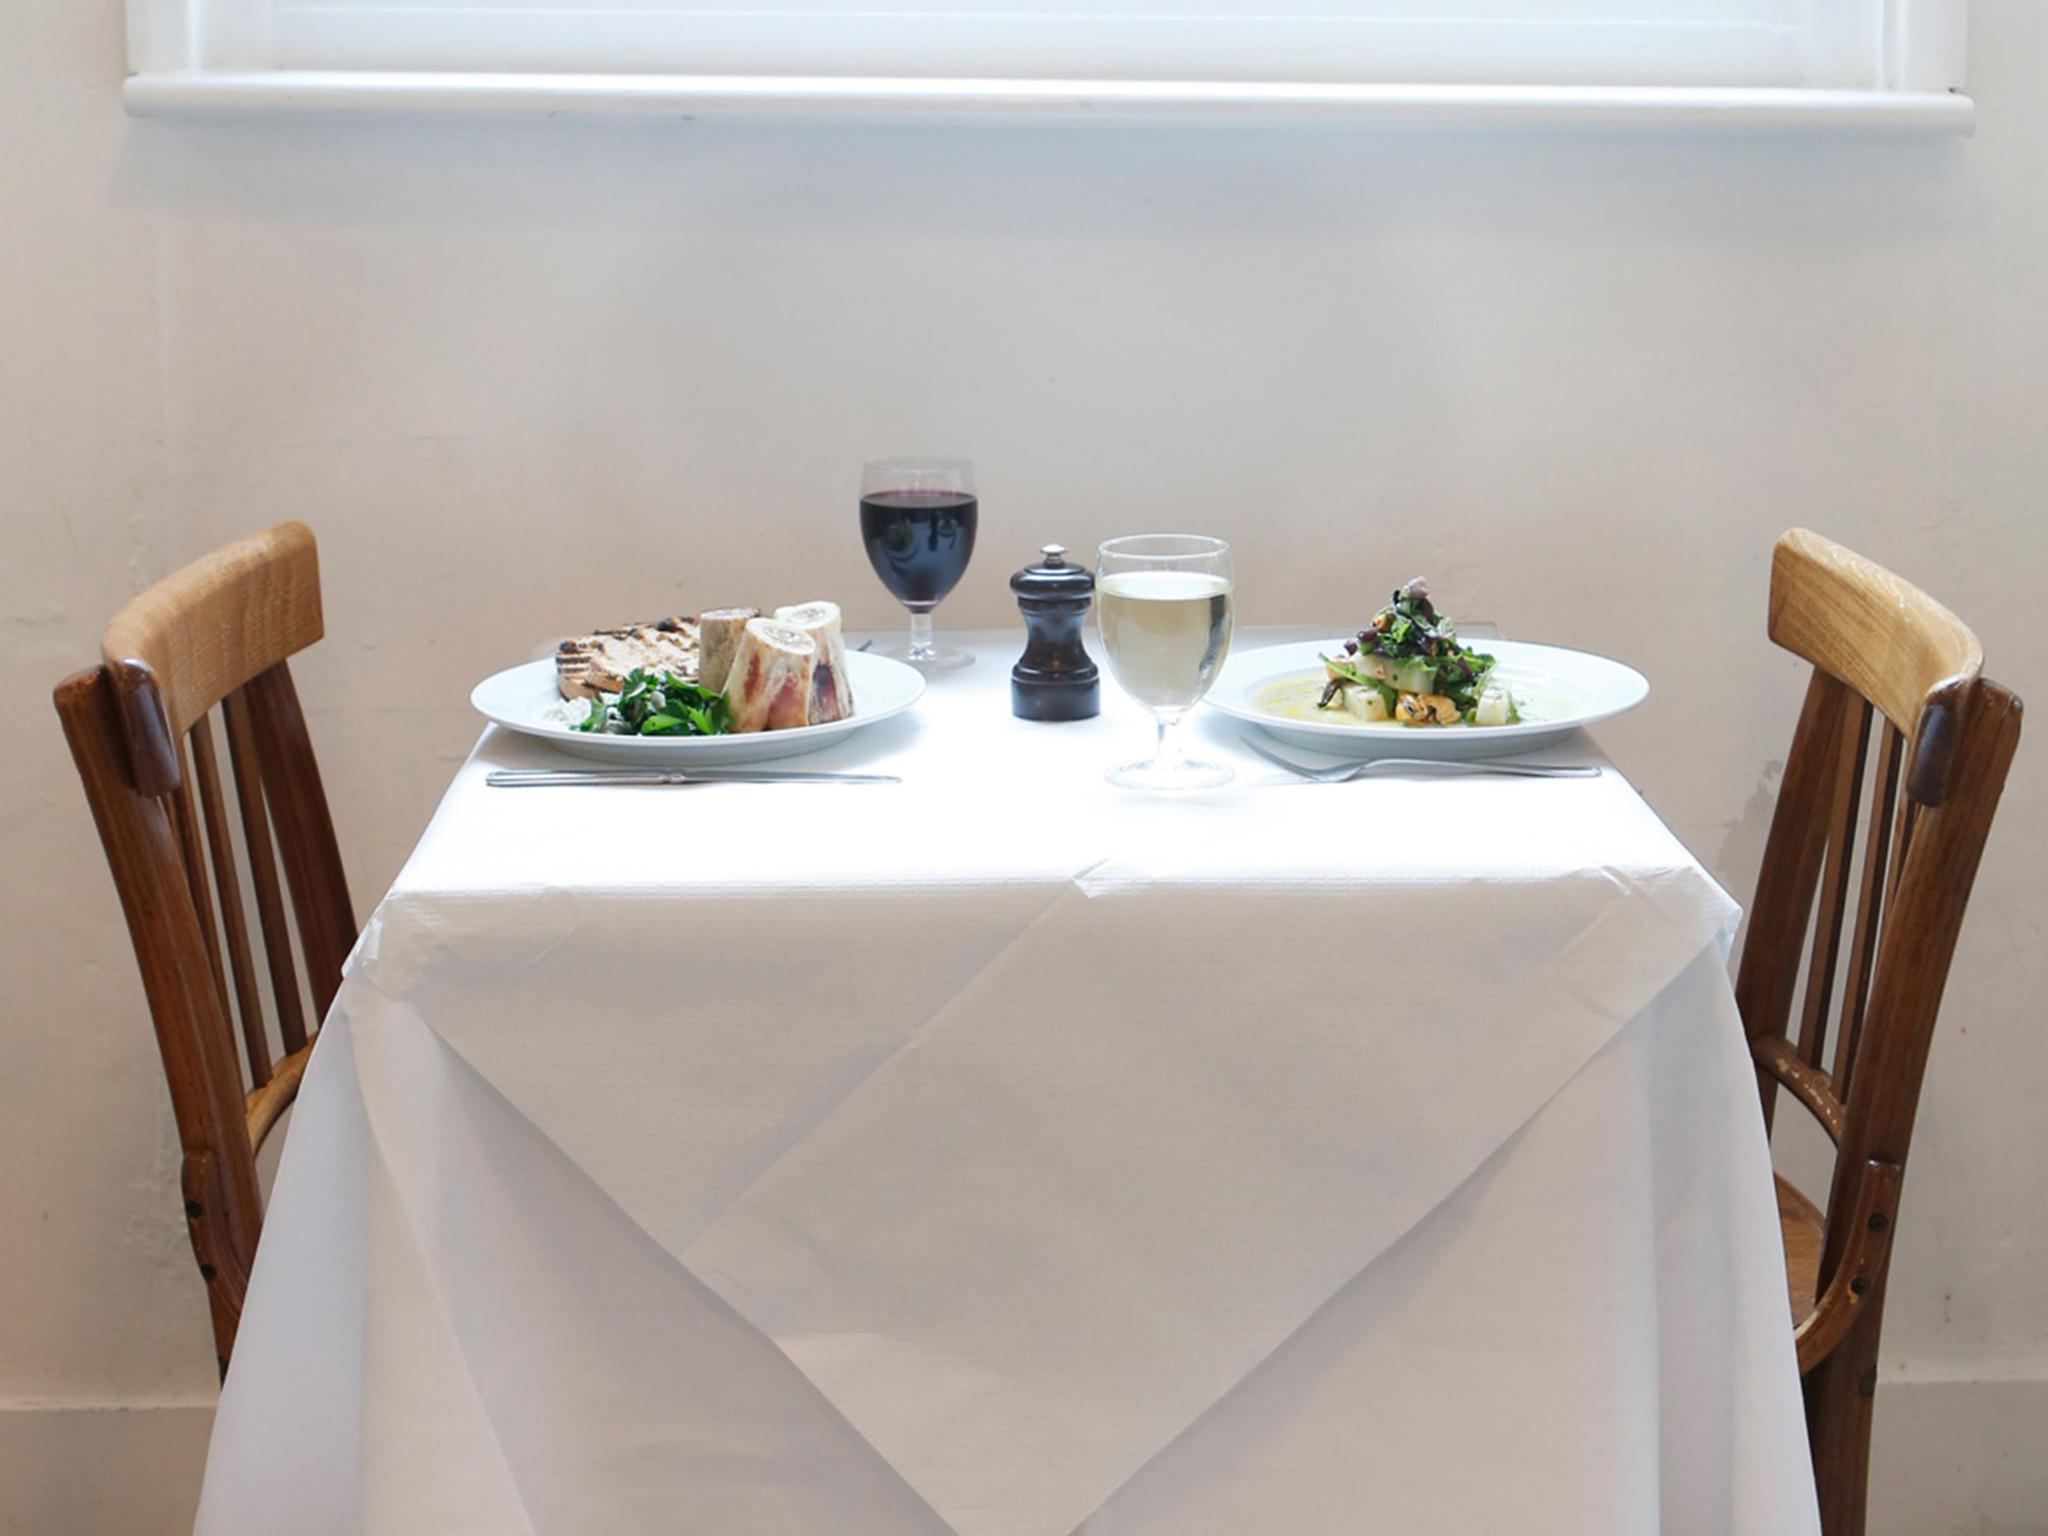 Top 10 restaurants in London - St John